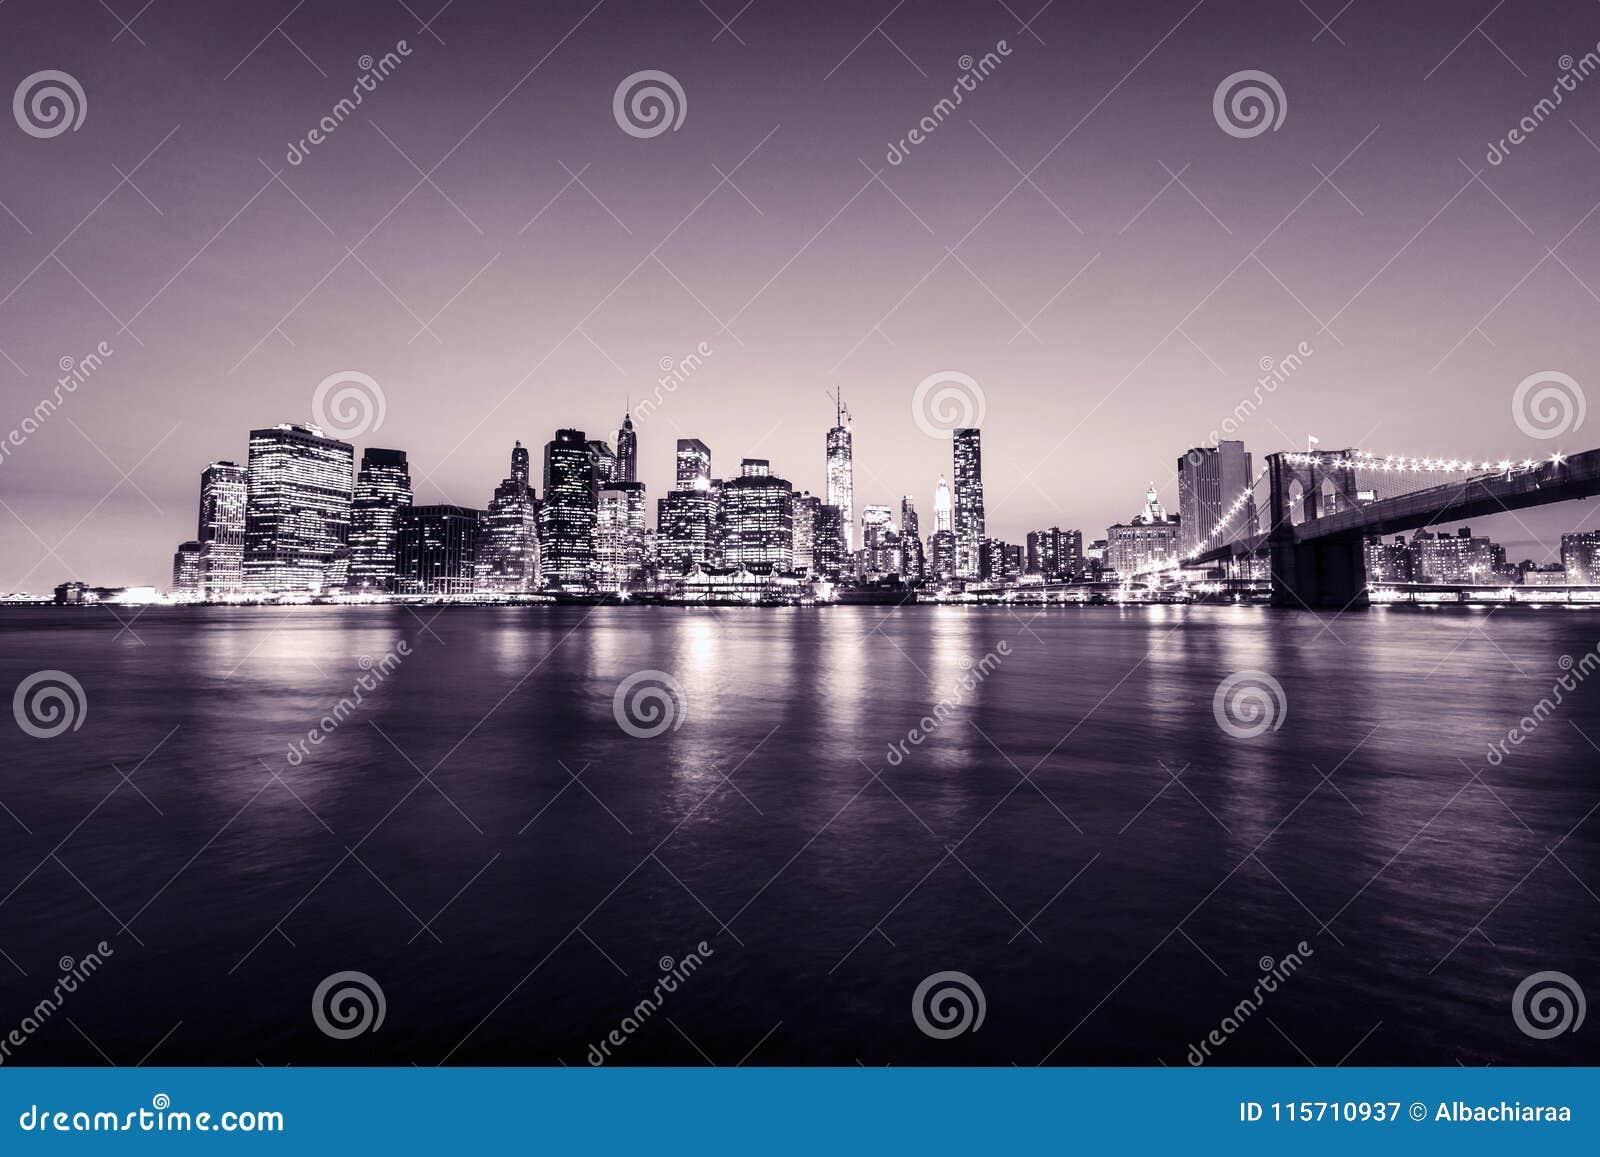 Manhattan skyline. New York city. USA. Panoramic view. Pink tones.